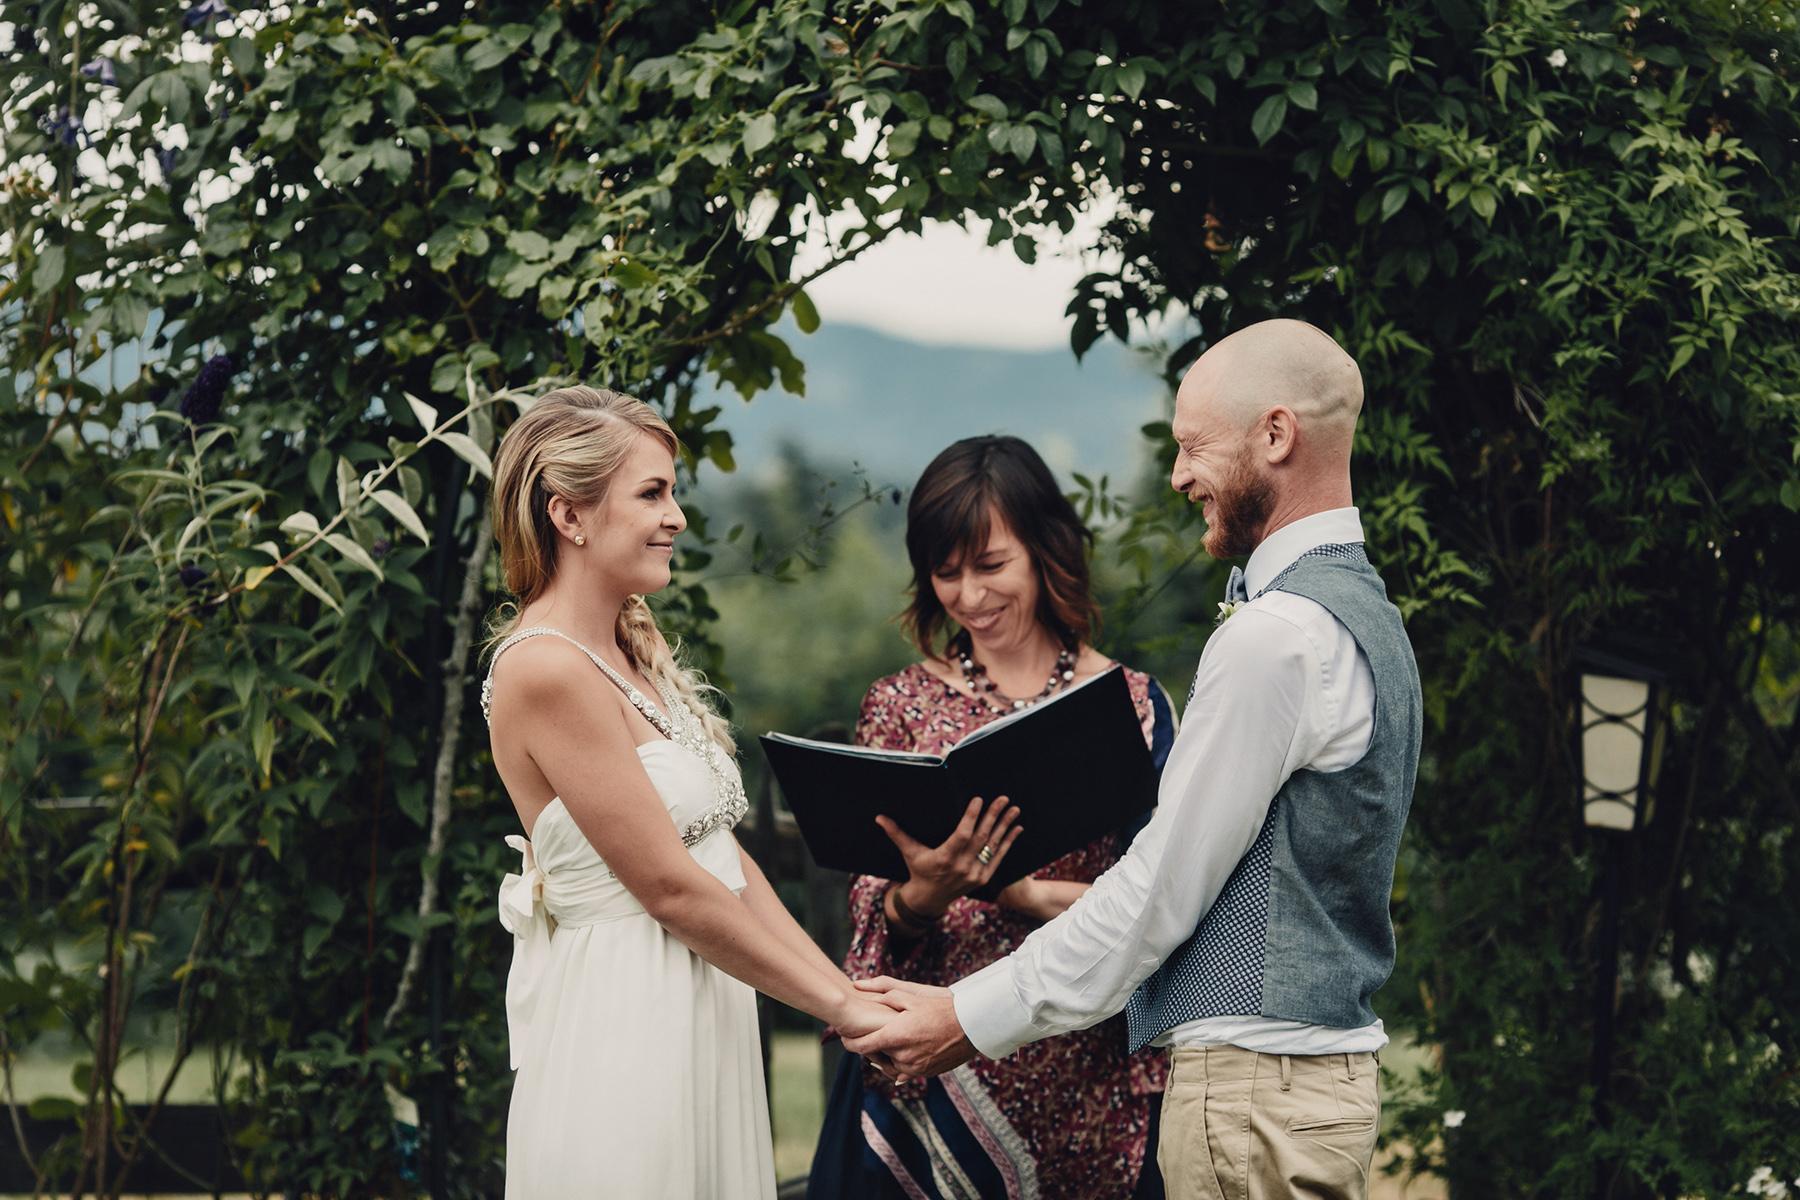 kildara-farms-wedding-photo-inspiration-0047